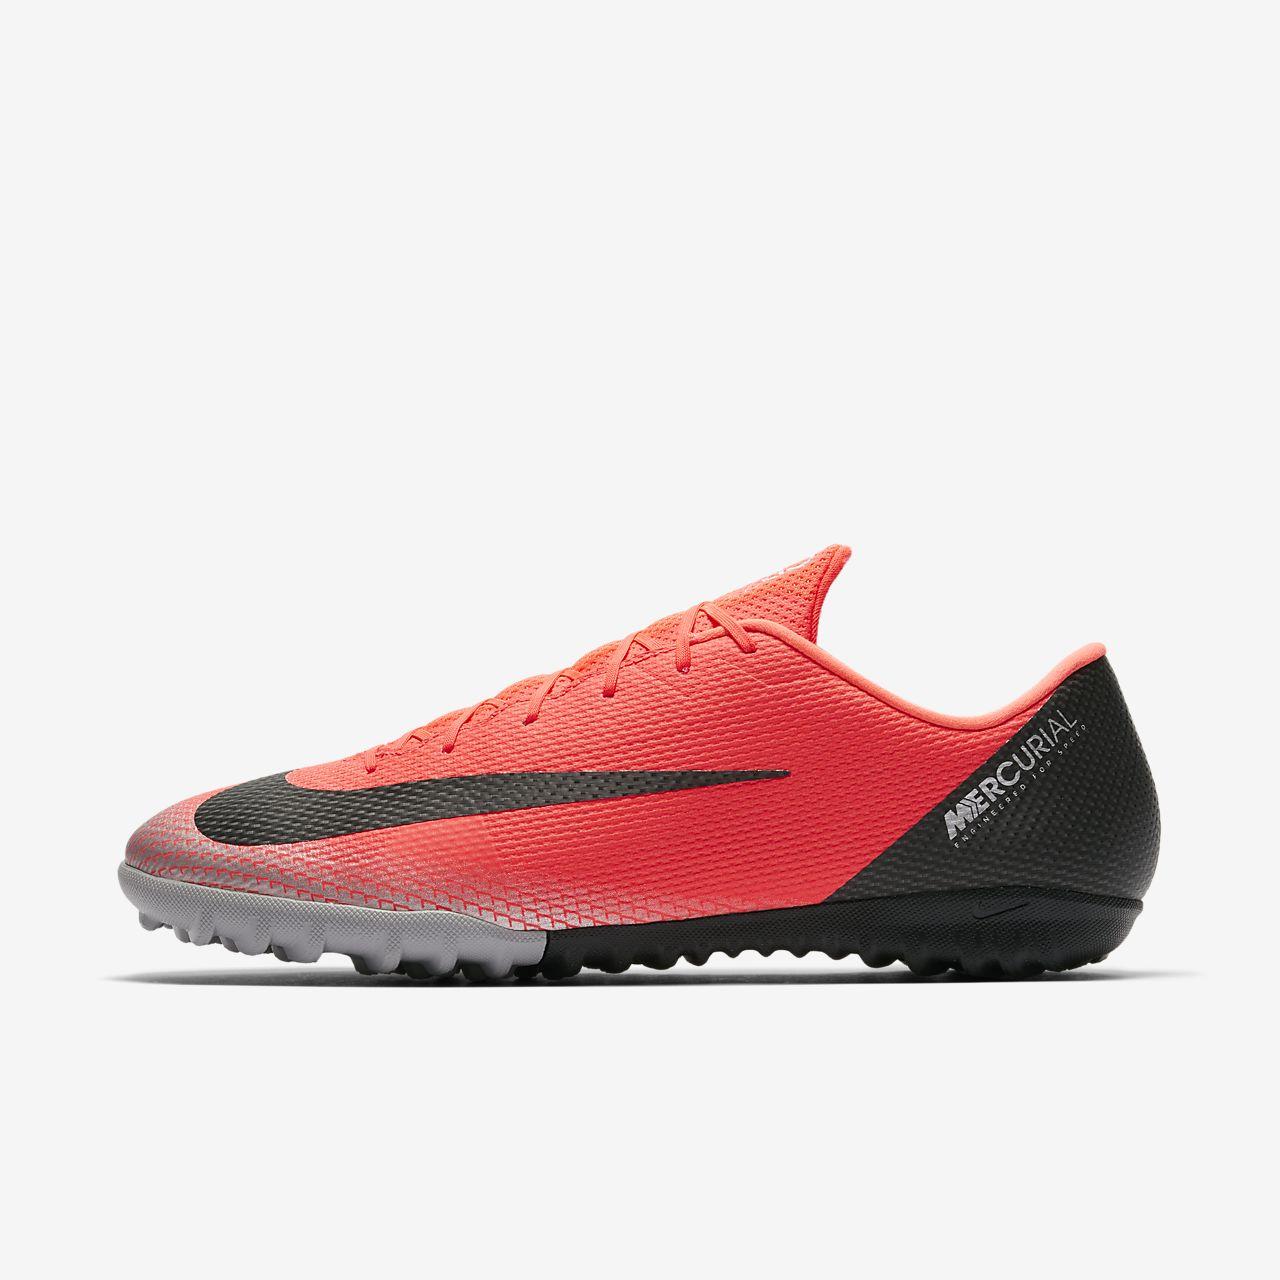 Nike MercurialX Vapor XII Academy CR7 草地足球鞋